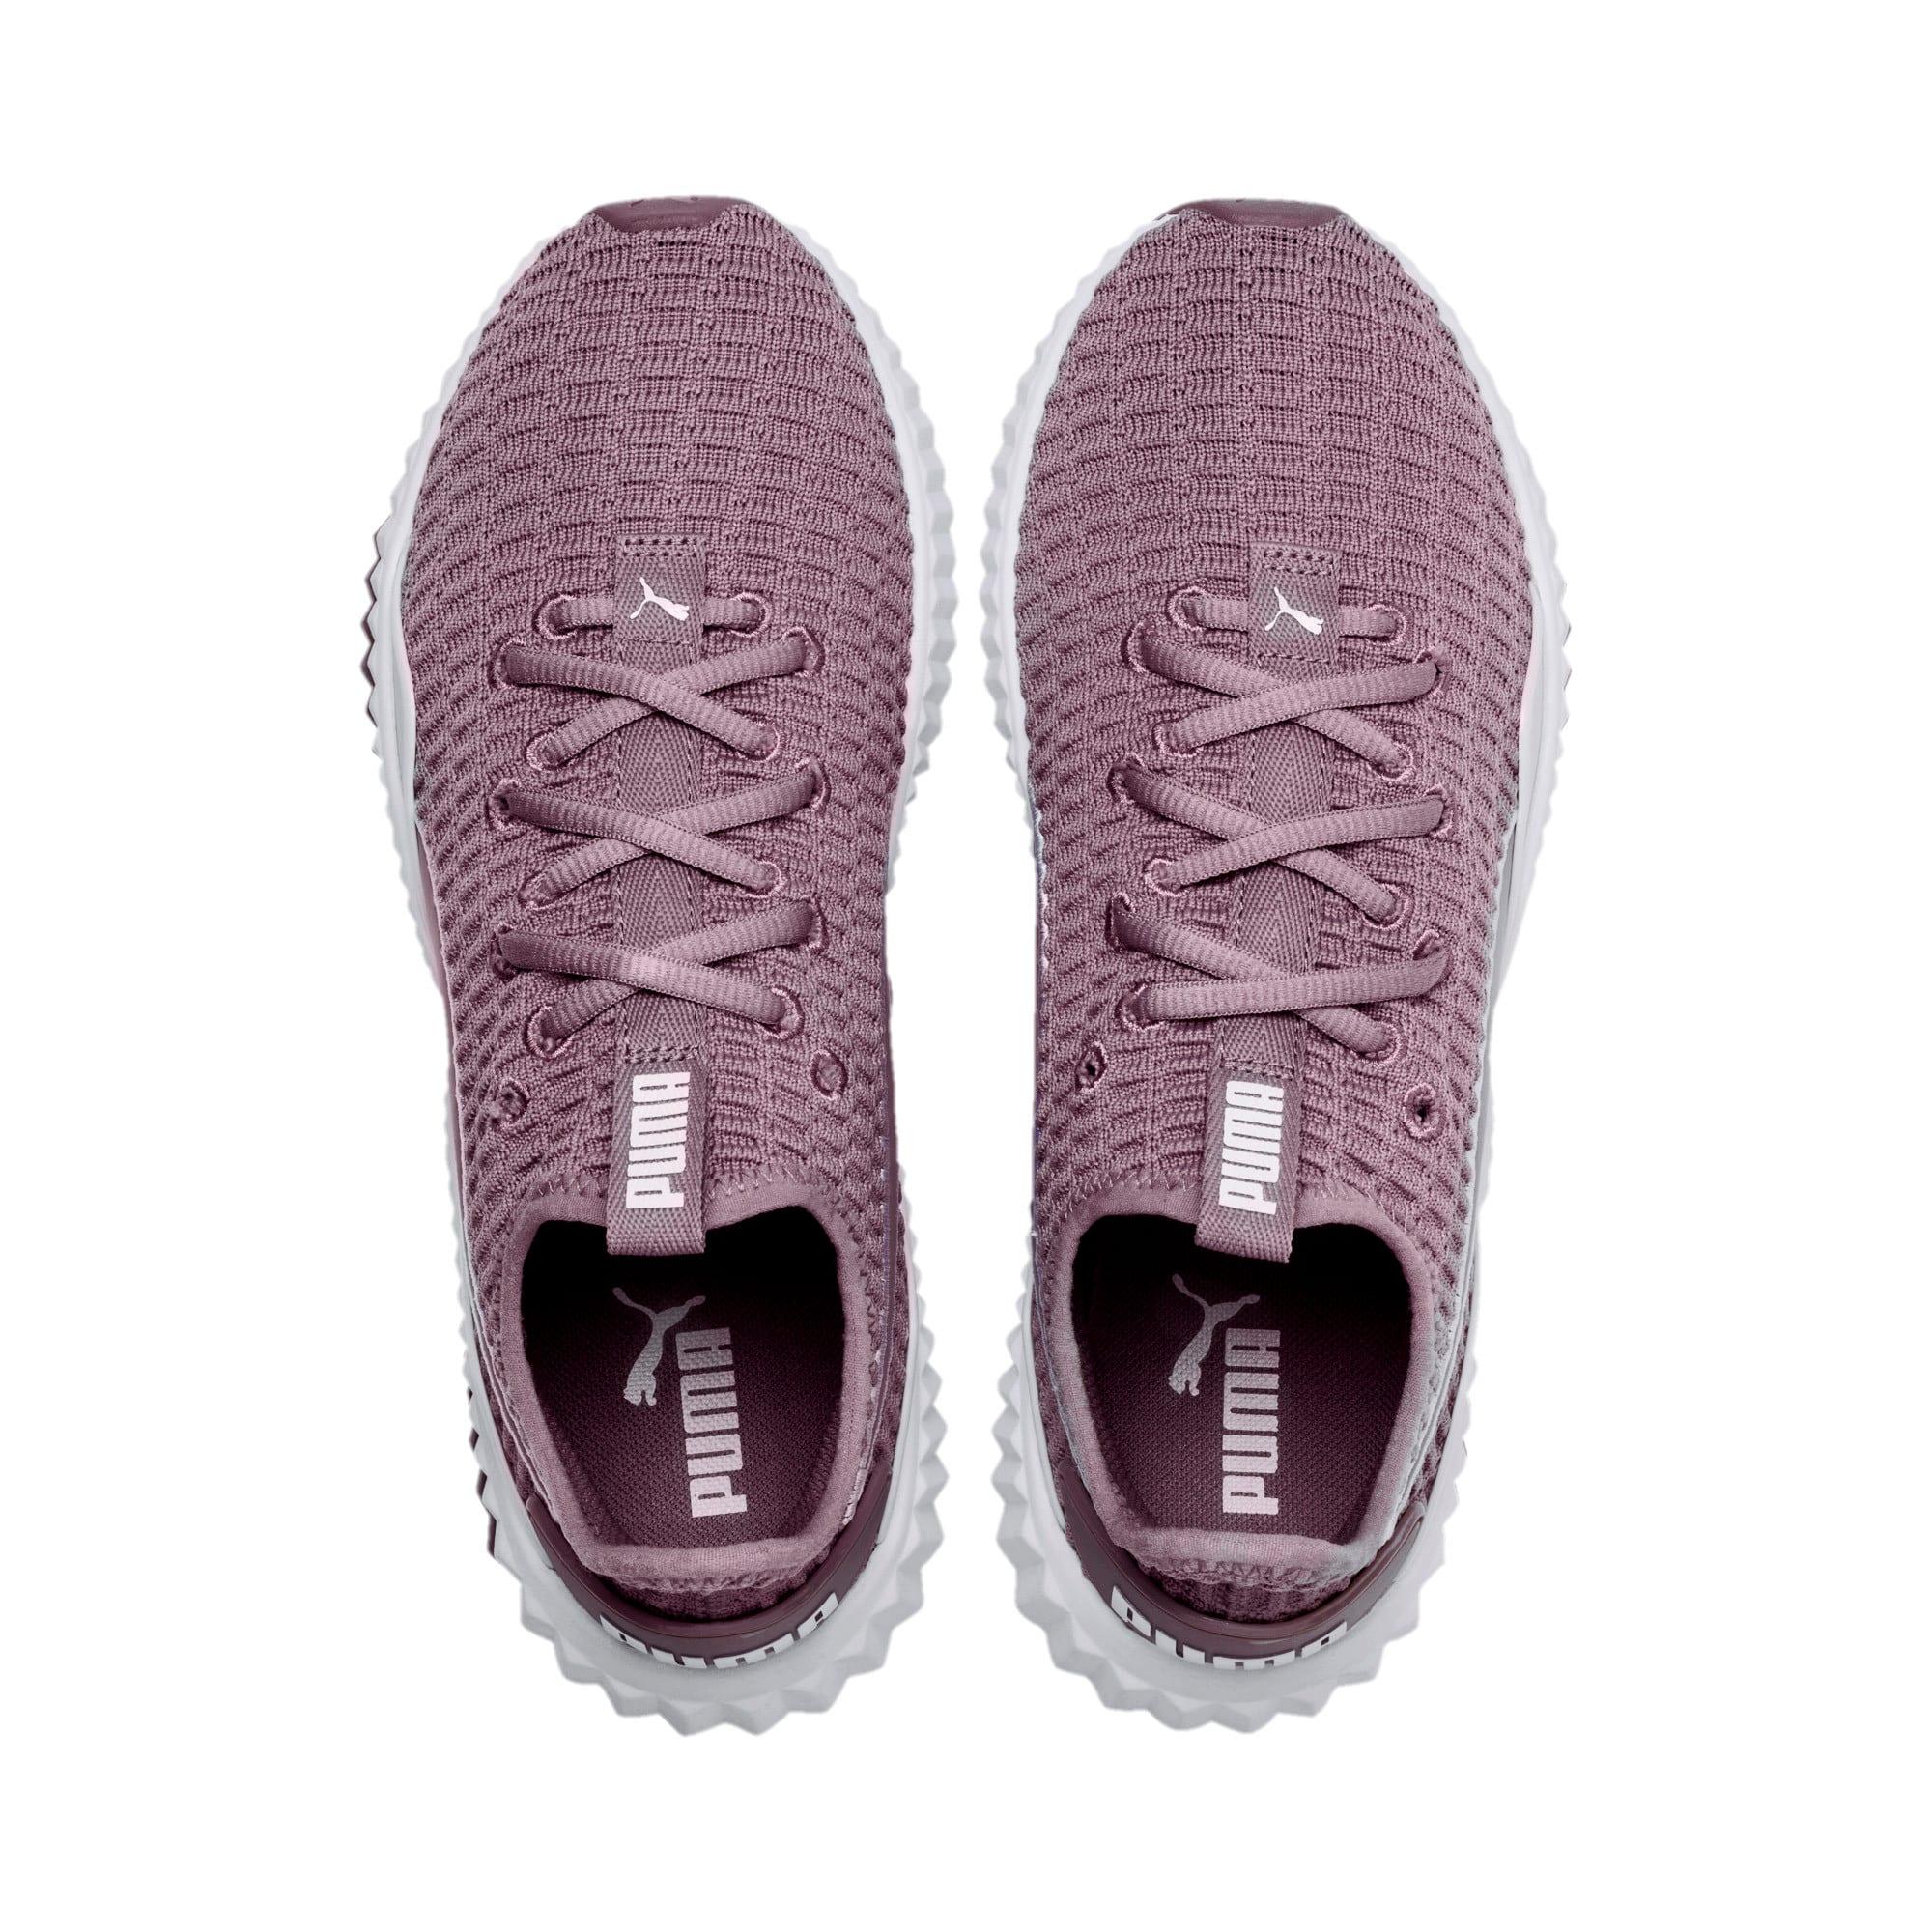 Thumbnail 6 of Defy Women's Training Shoes, Elderberry-Puma White, medium